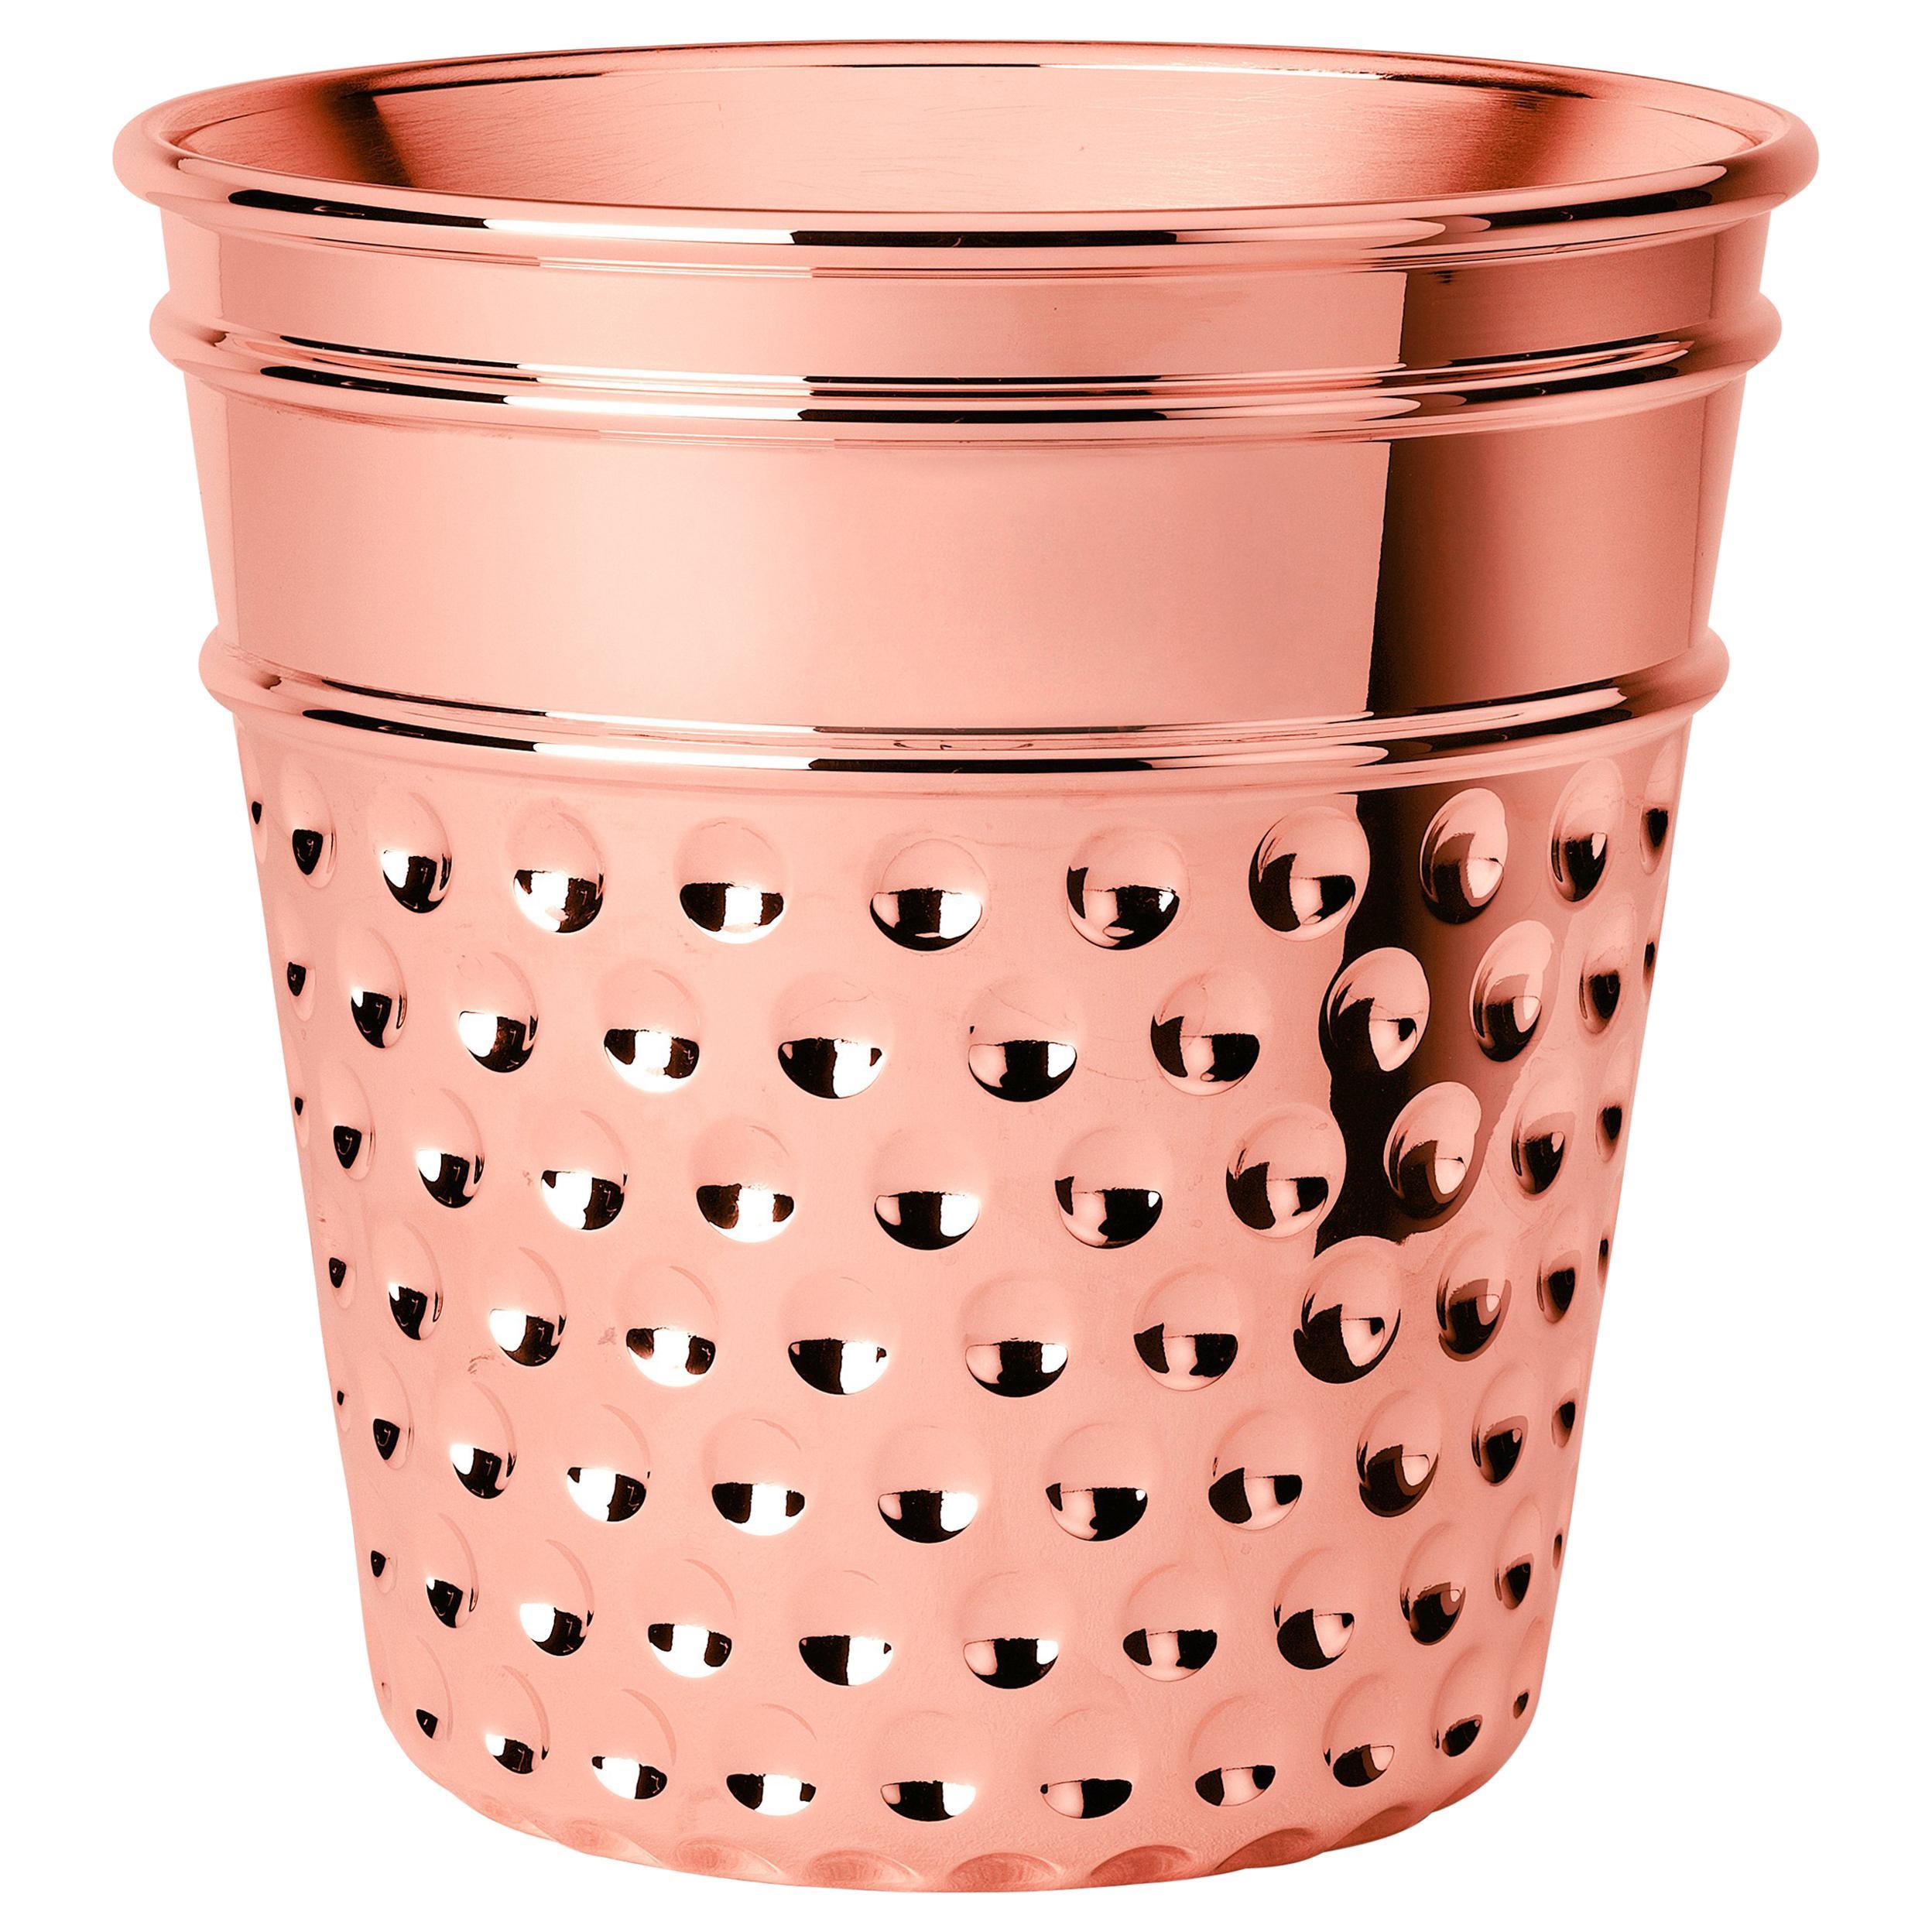 Ghidini 1961 Thimble Ice Bucket in Copper by Studio Job